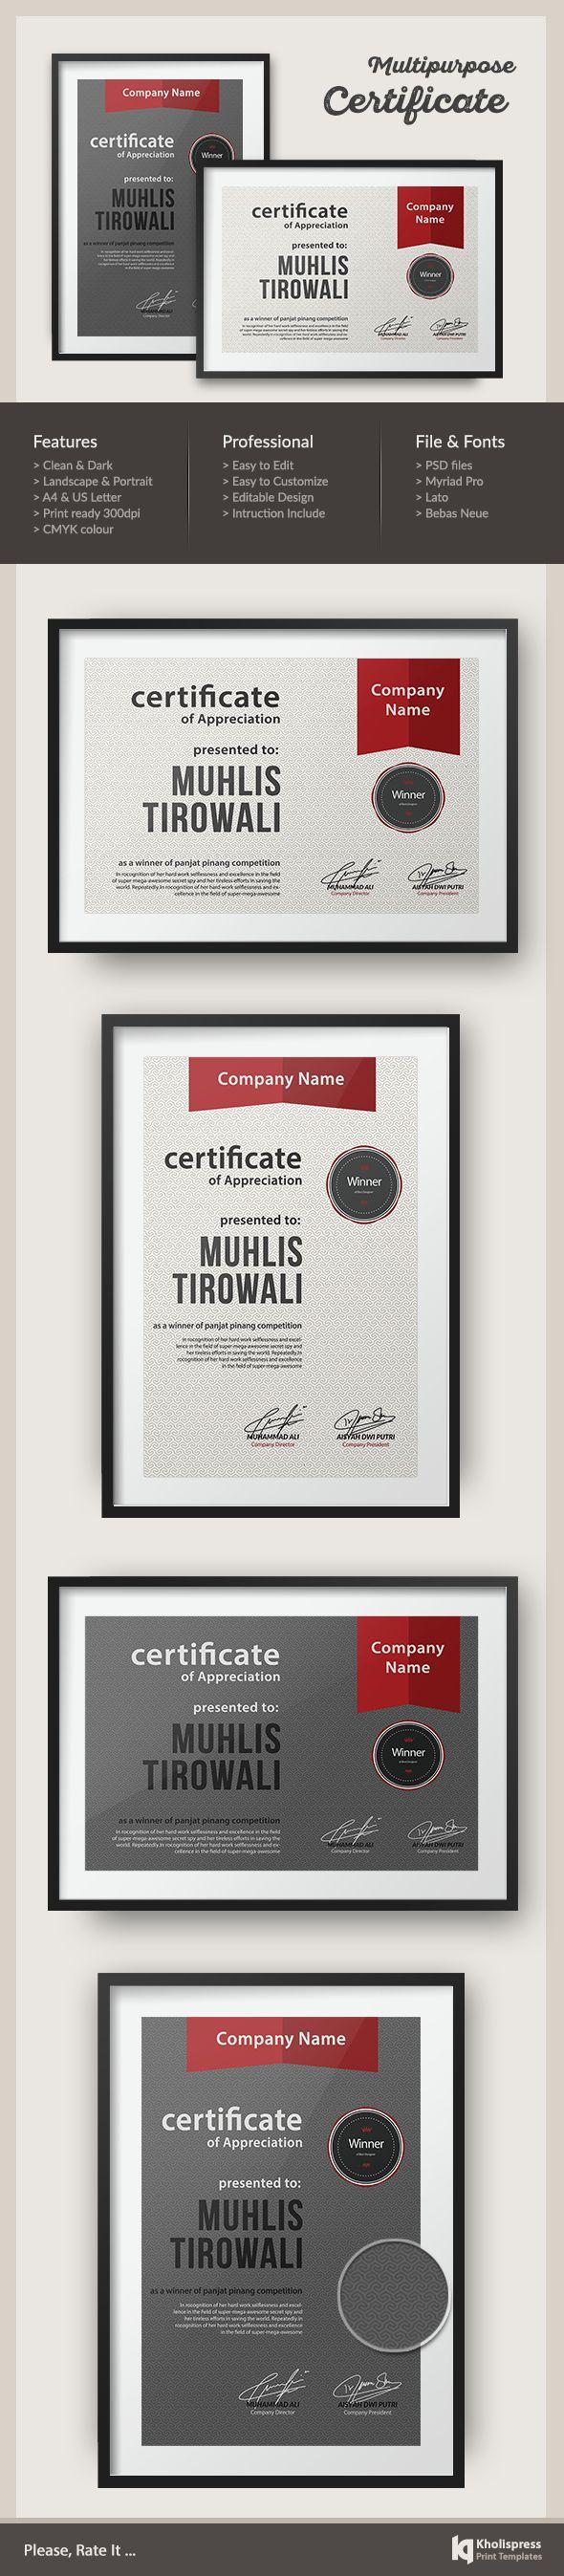 Pattern Certificate Template on Behance